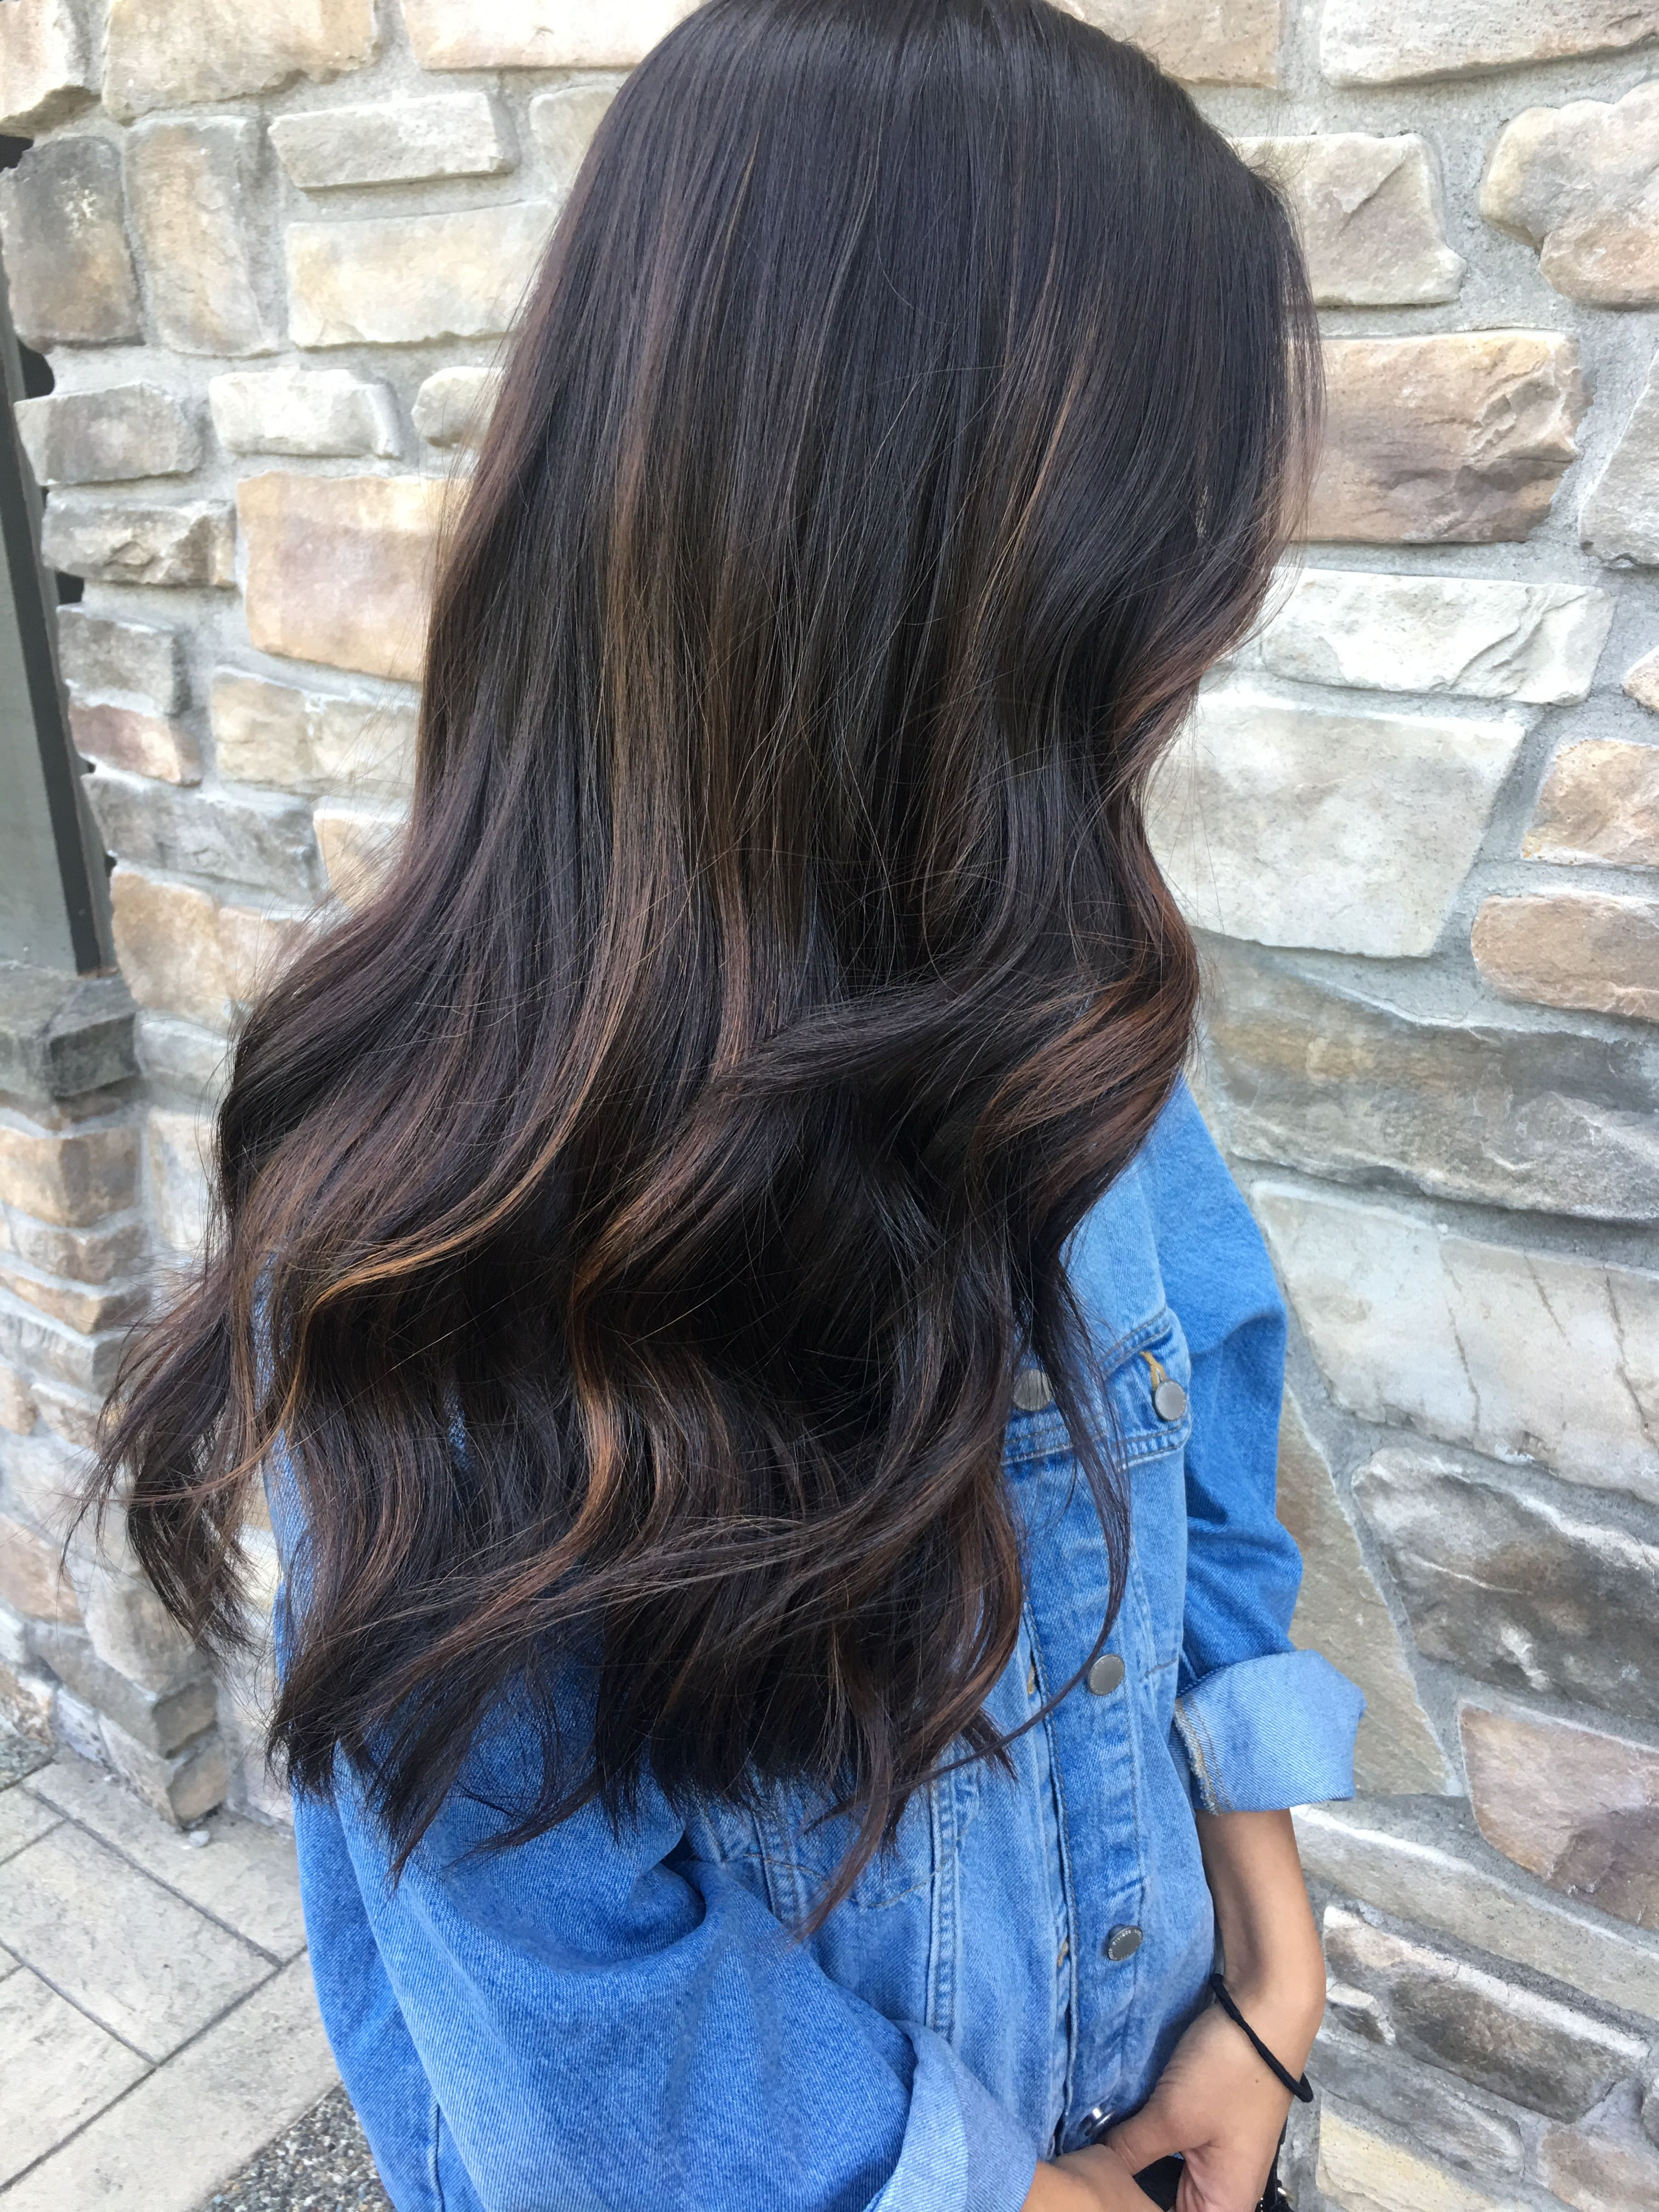 Subtle Dark Hair Caramel Balayage Long Hair Waves Long Hair Color Long Hair Styles